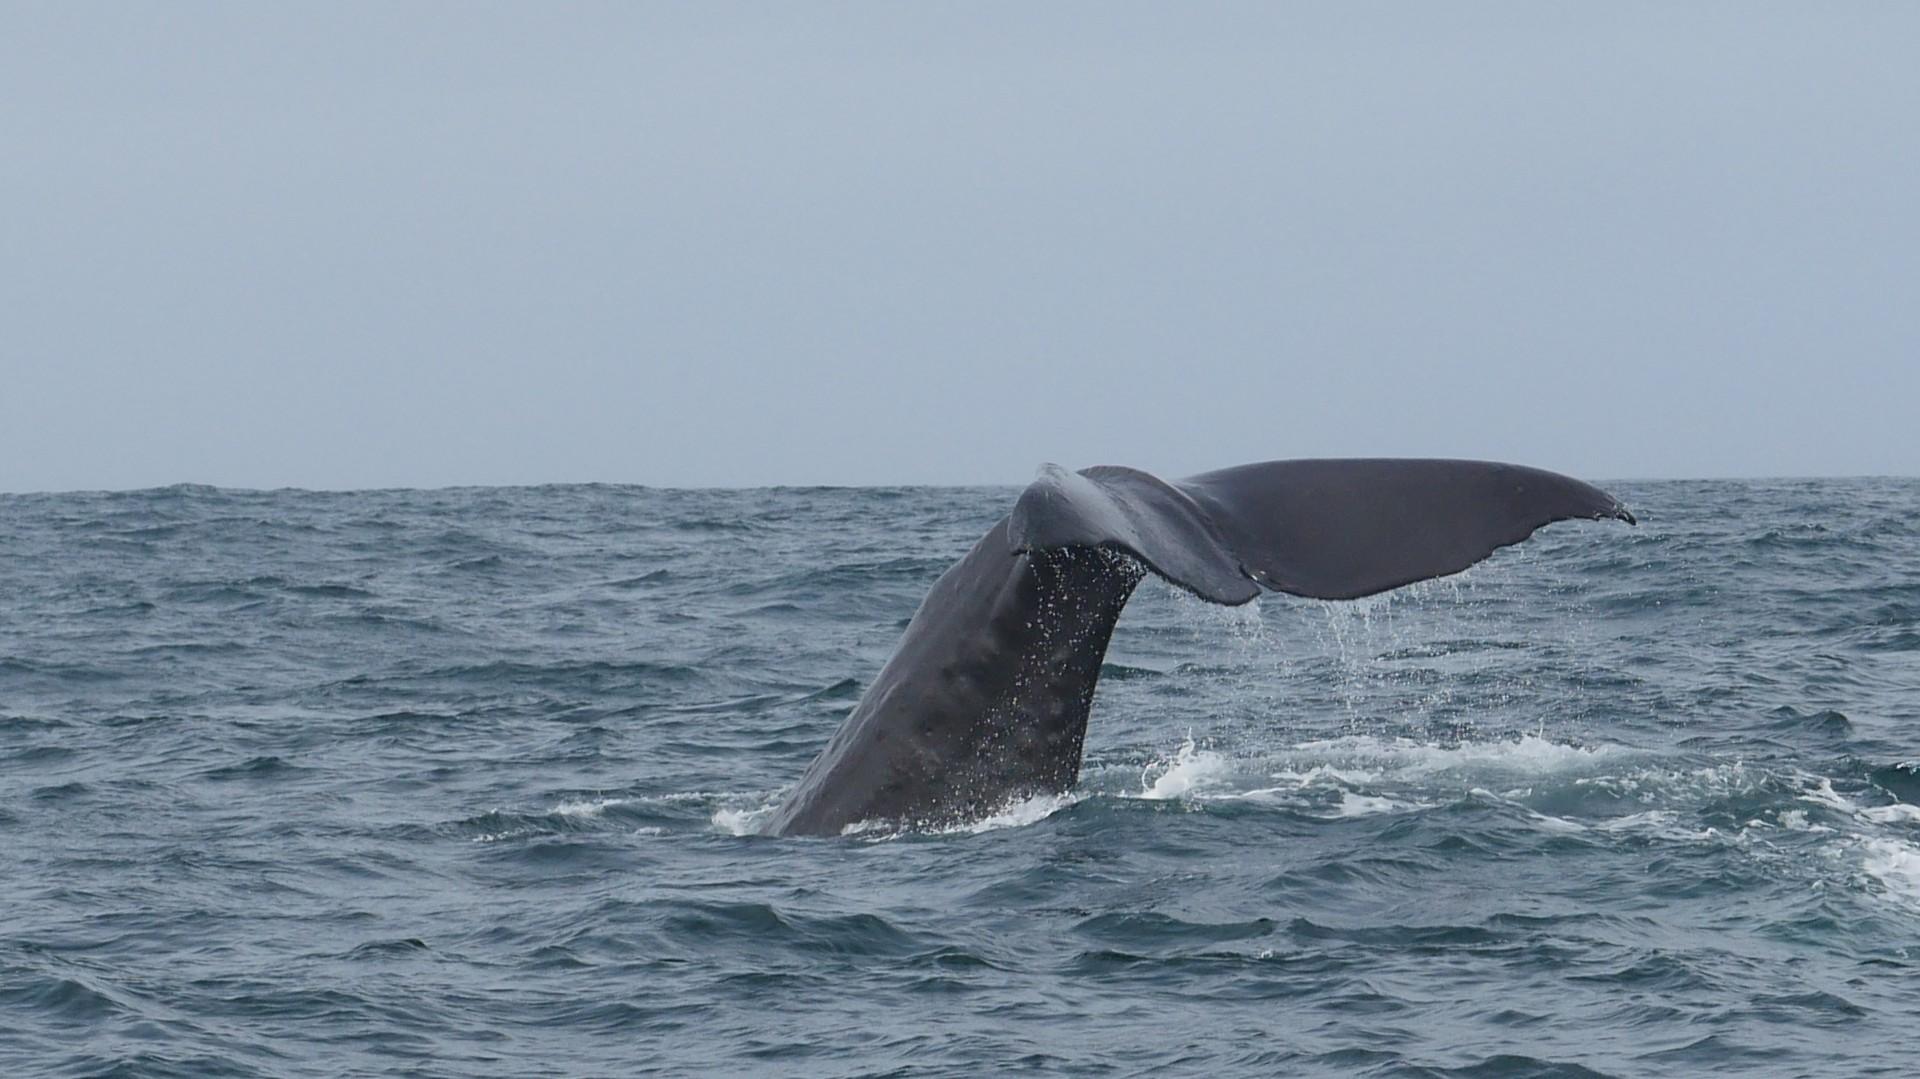 Kaikoura, Wale Watching, Seelöwen und grandiose Landschaft